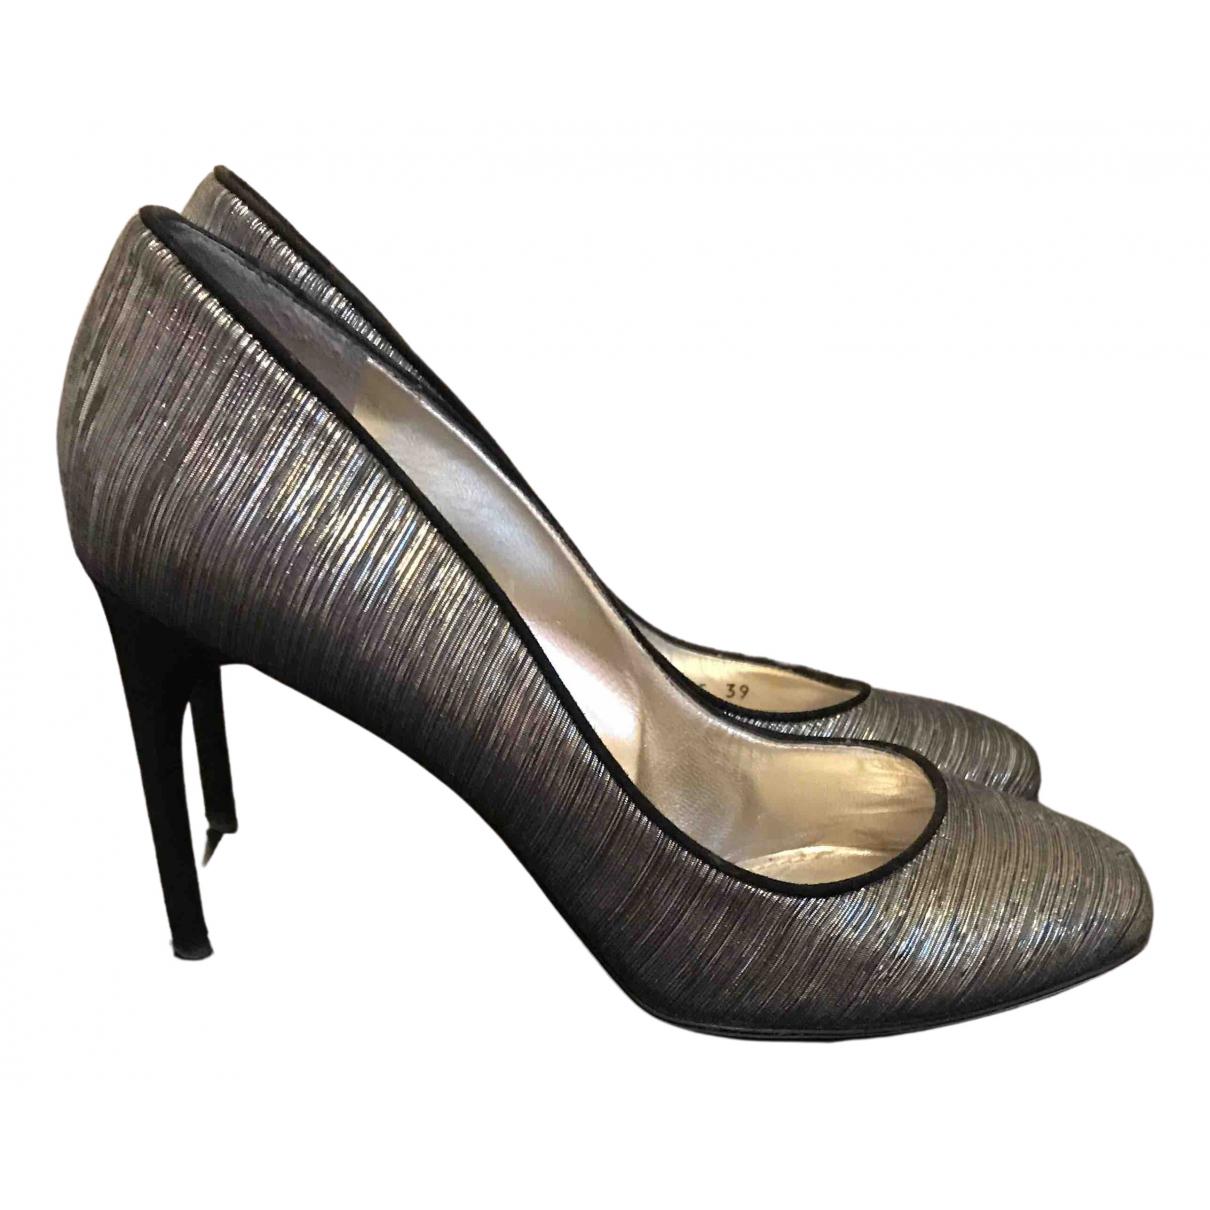 D&g \N Silver Leather Heels for Women 39 EU